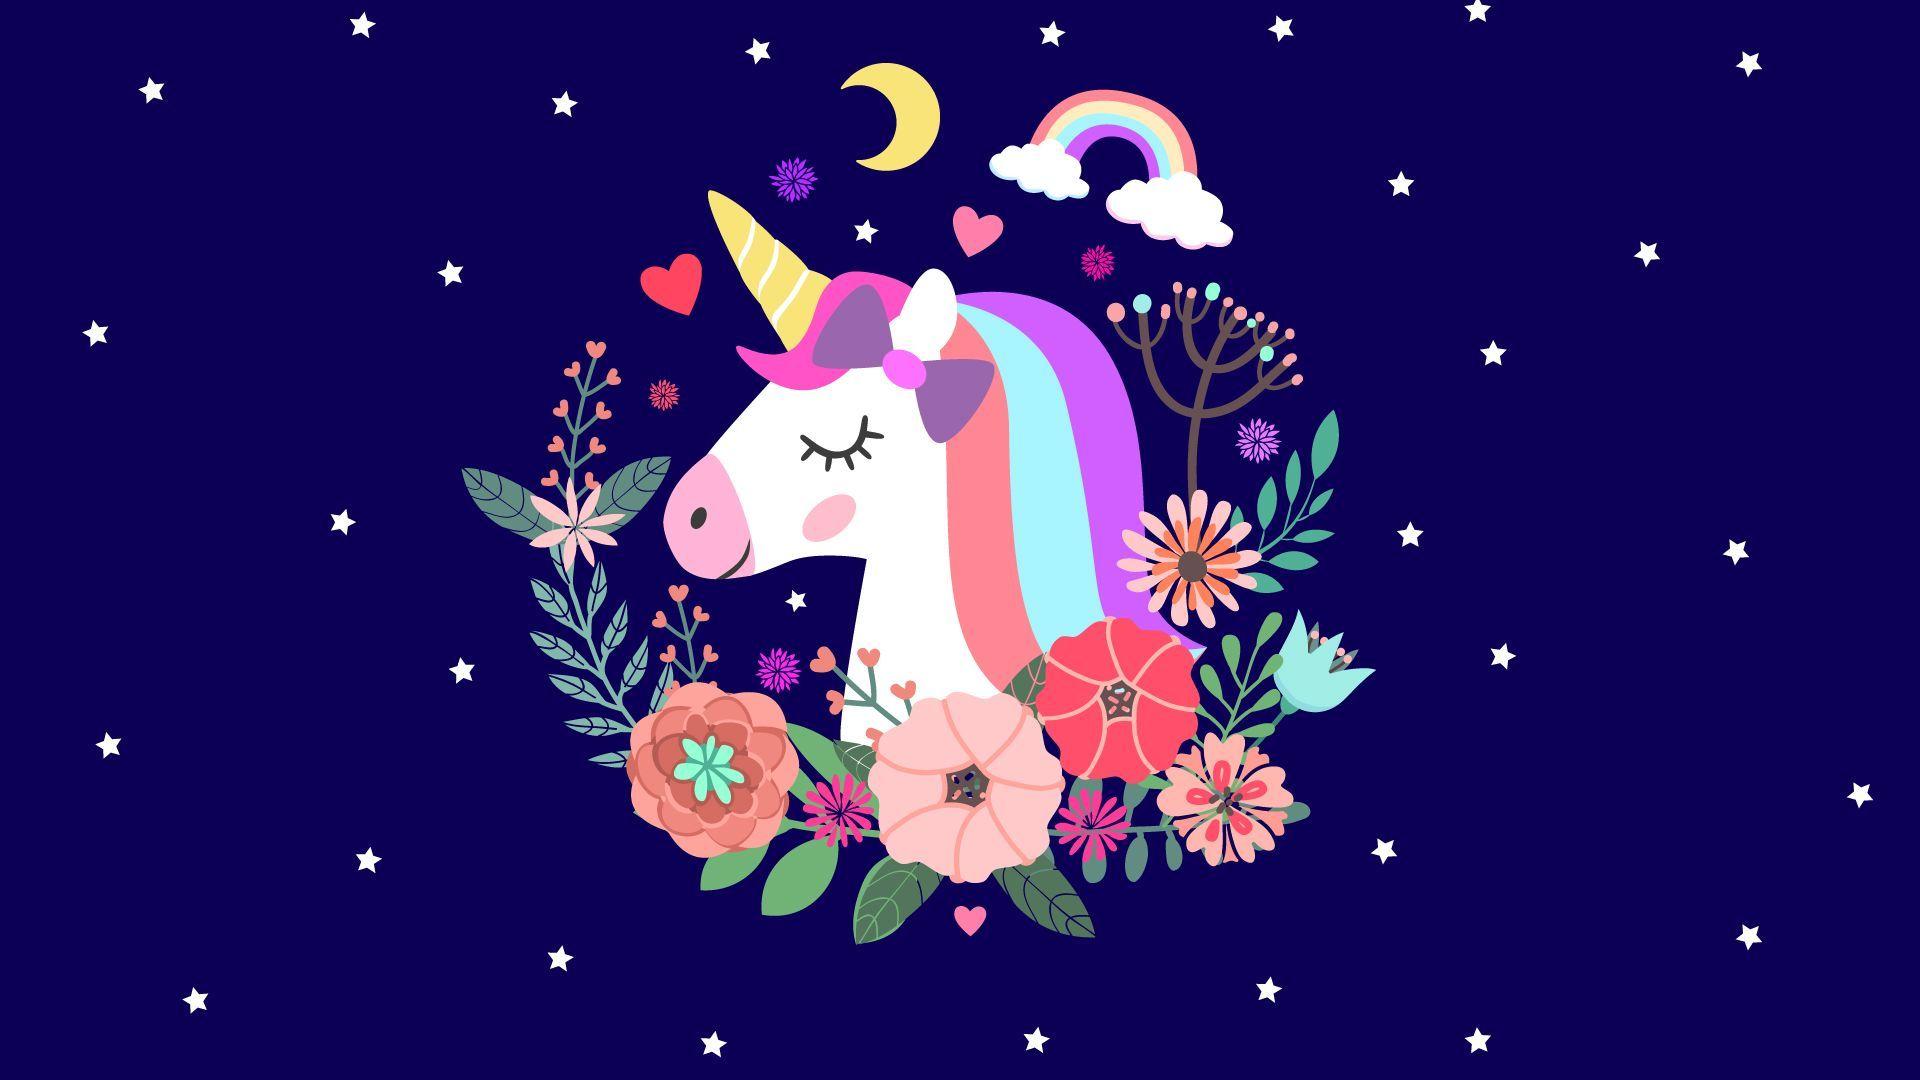 90+ Beautiful Unicorn Wallpaper Ideas for Computer